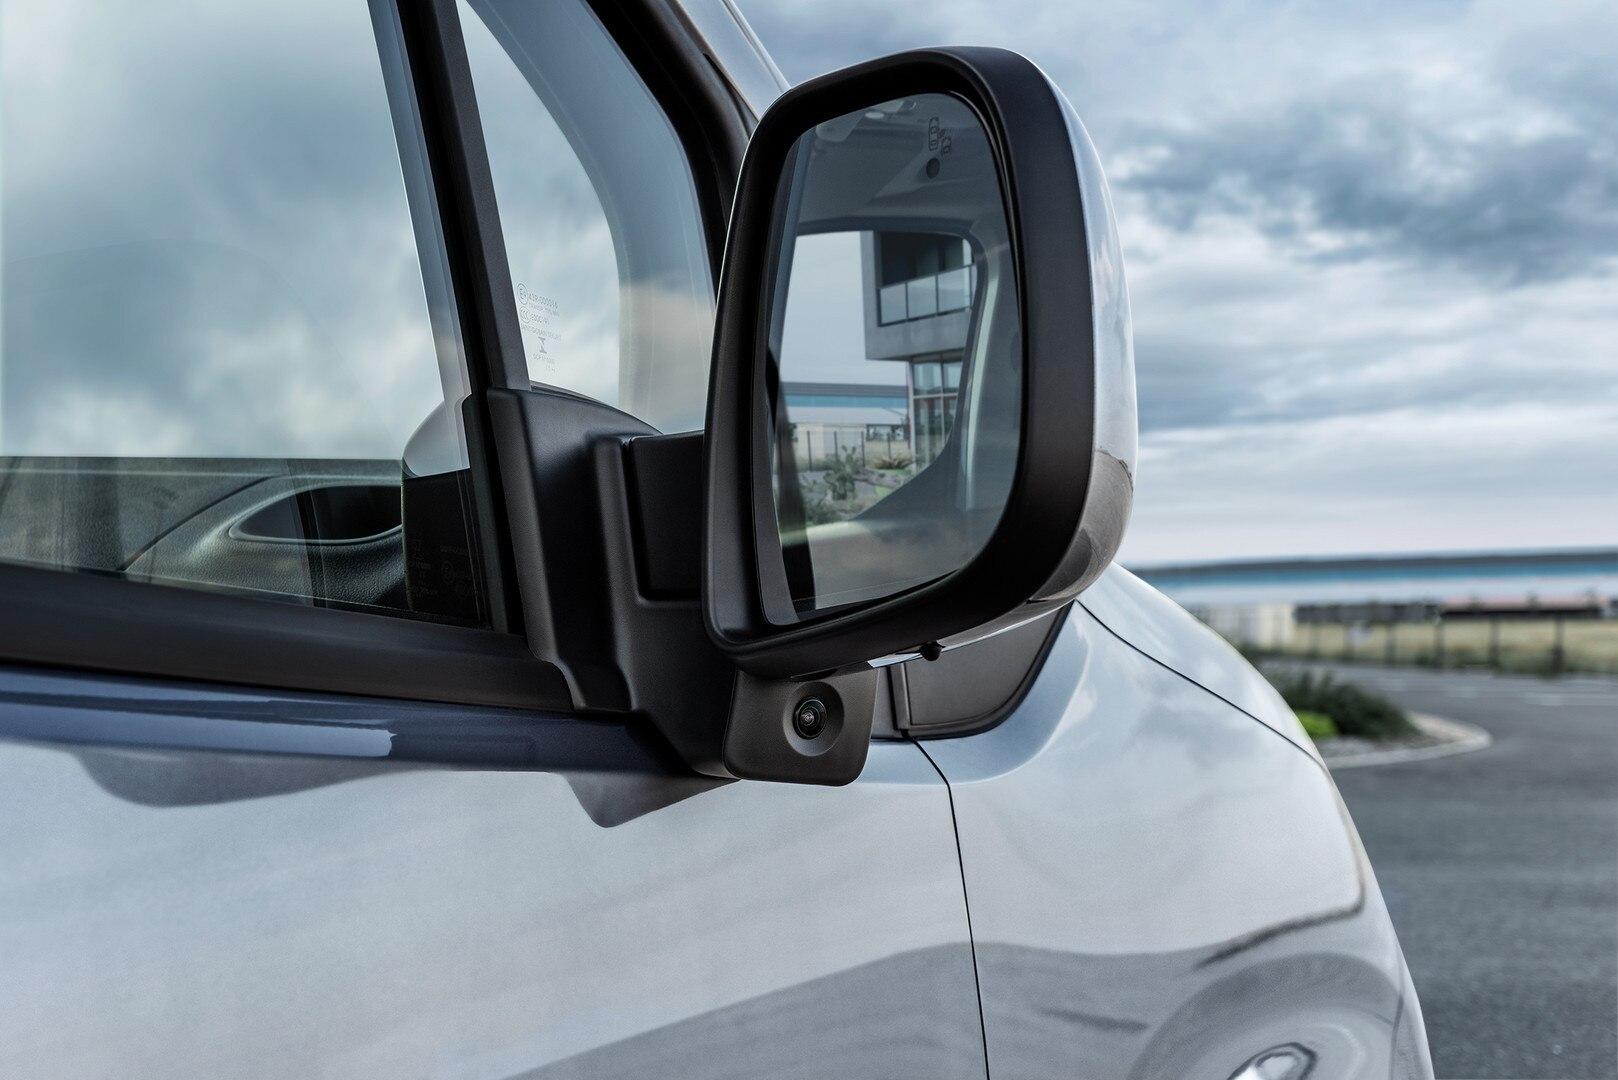 PEUGEOT-Partner-Kastenwagen-Seitenspiegel